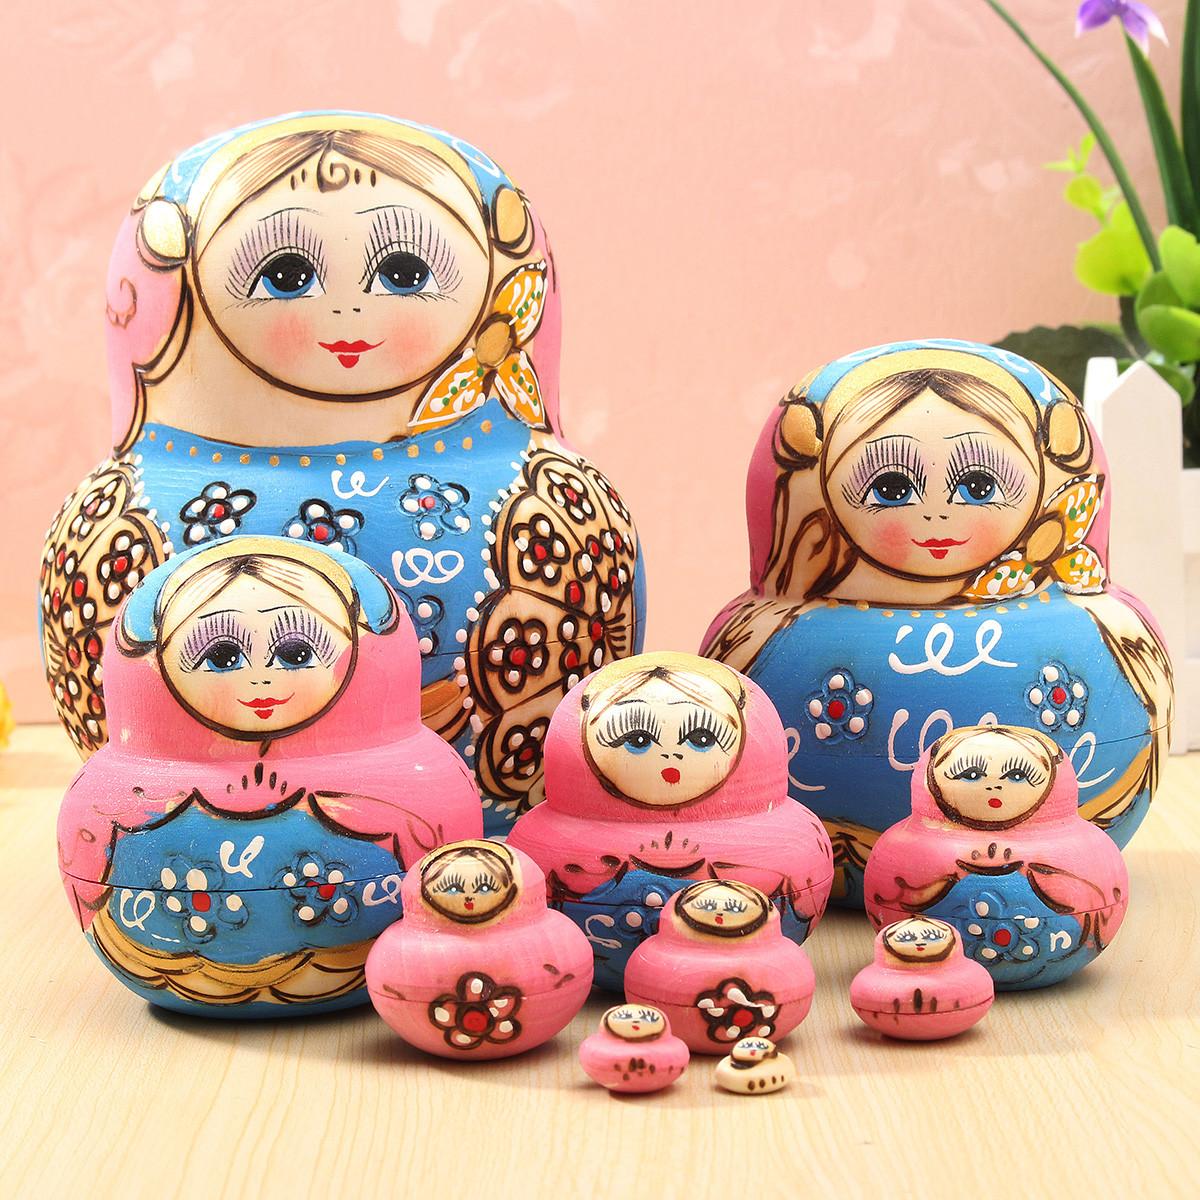 10pcs Hand Painted Blue Dolls Set Wooden Russian Nesting Babushka Matryoshka